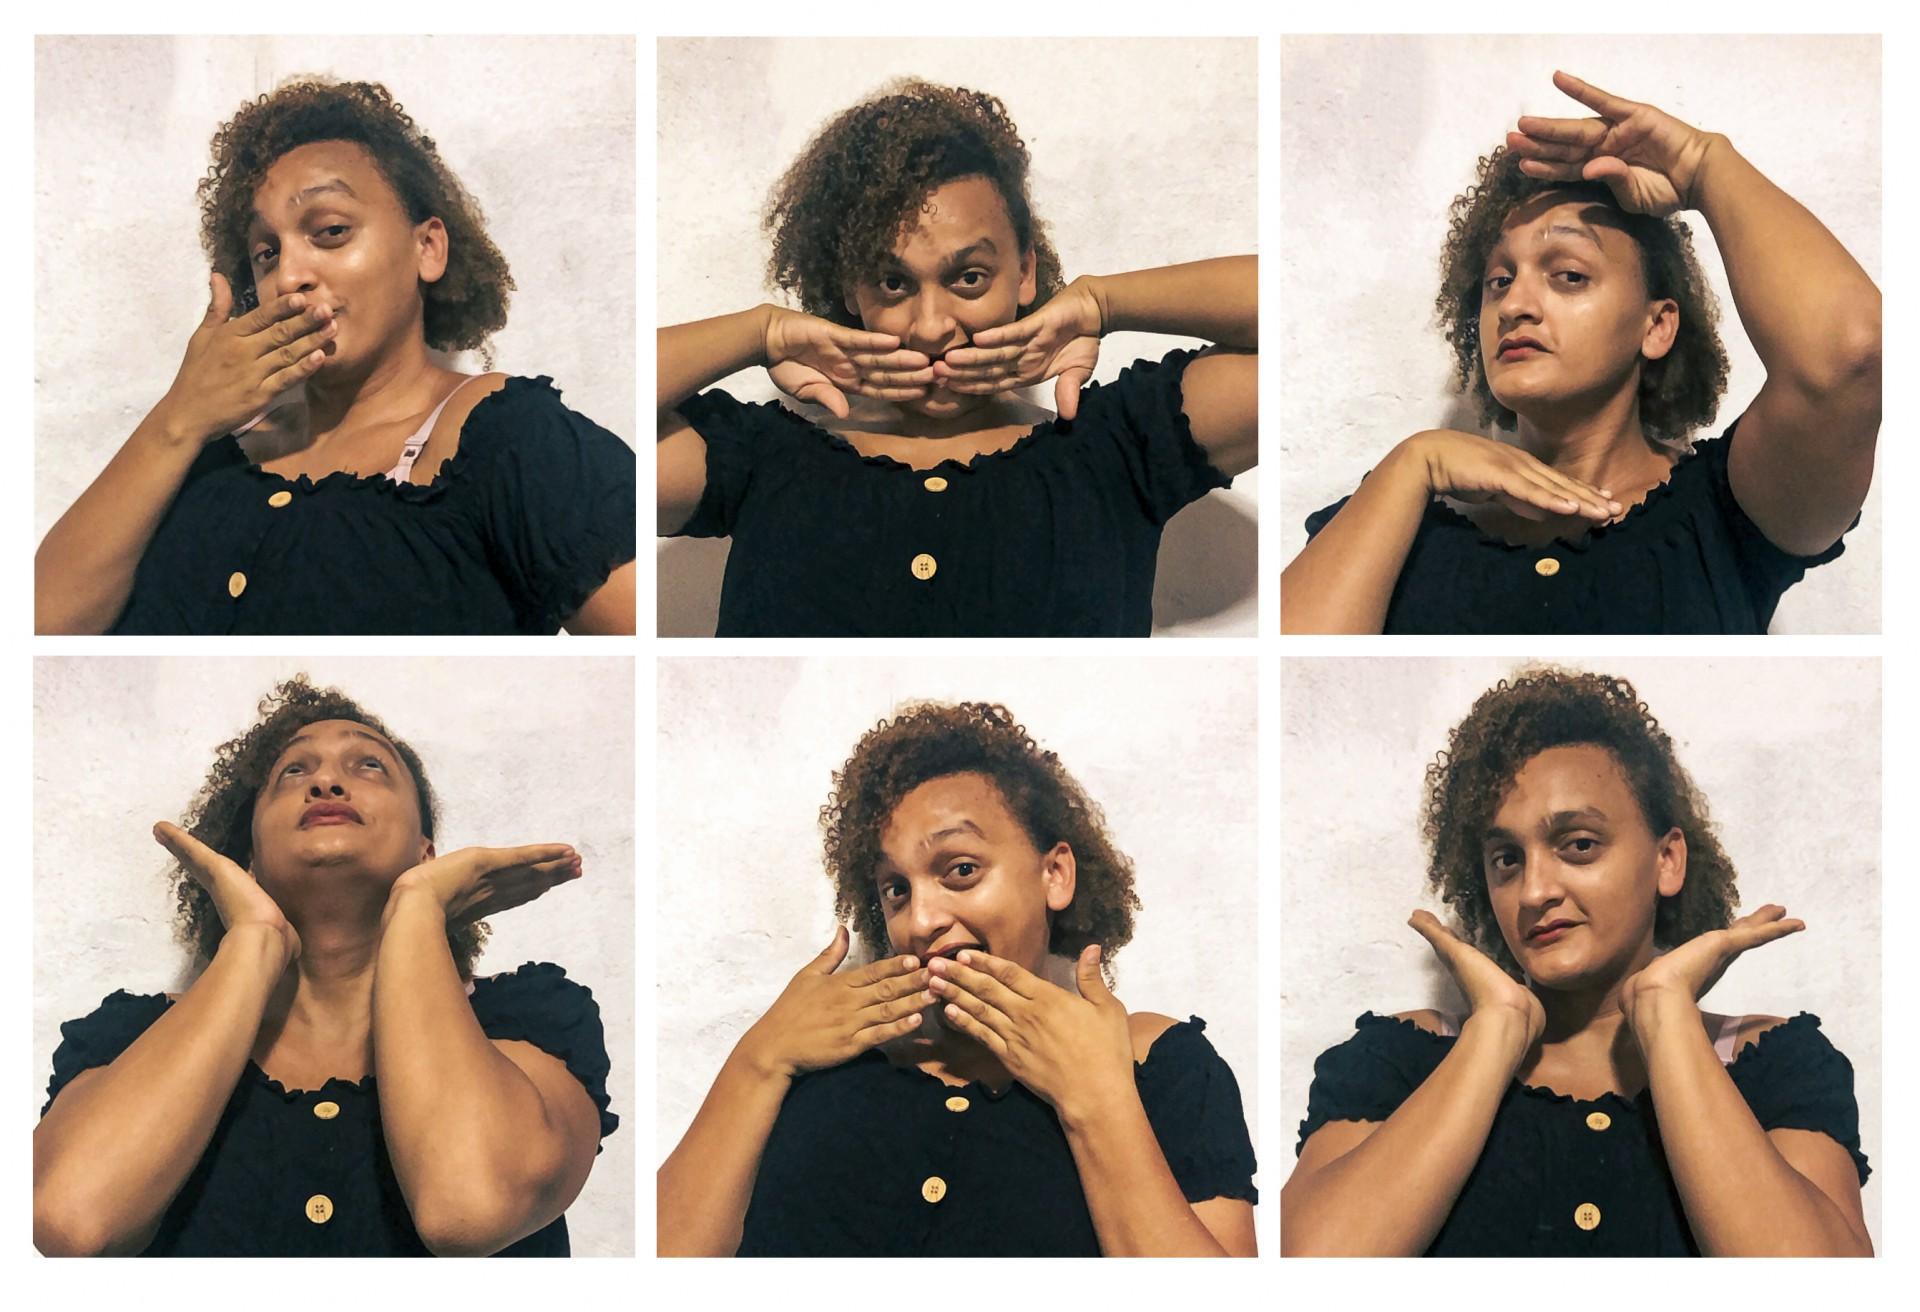 FORTALEZA, CE, BRASIL, 26.03.2021: Faela Maya, cearense de Jaguaribe, autora da WebNovela